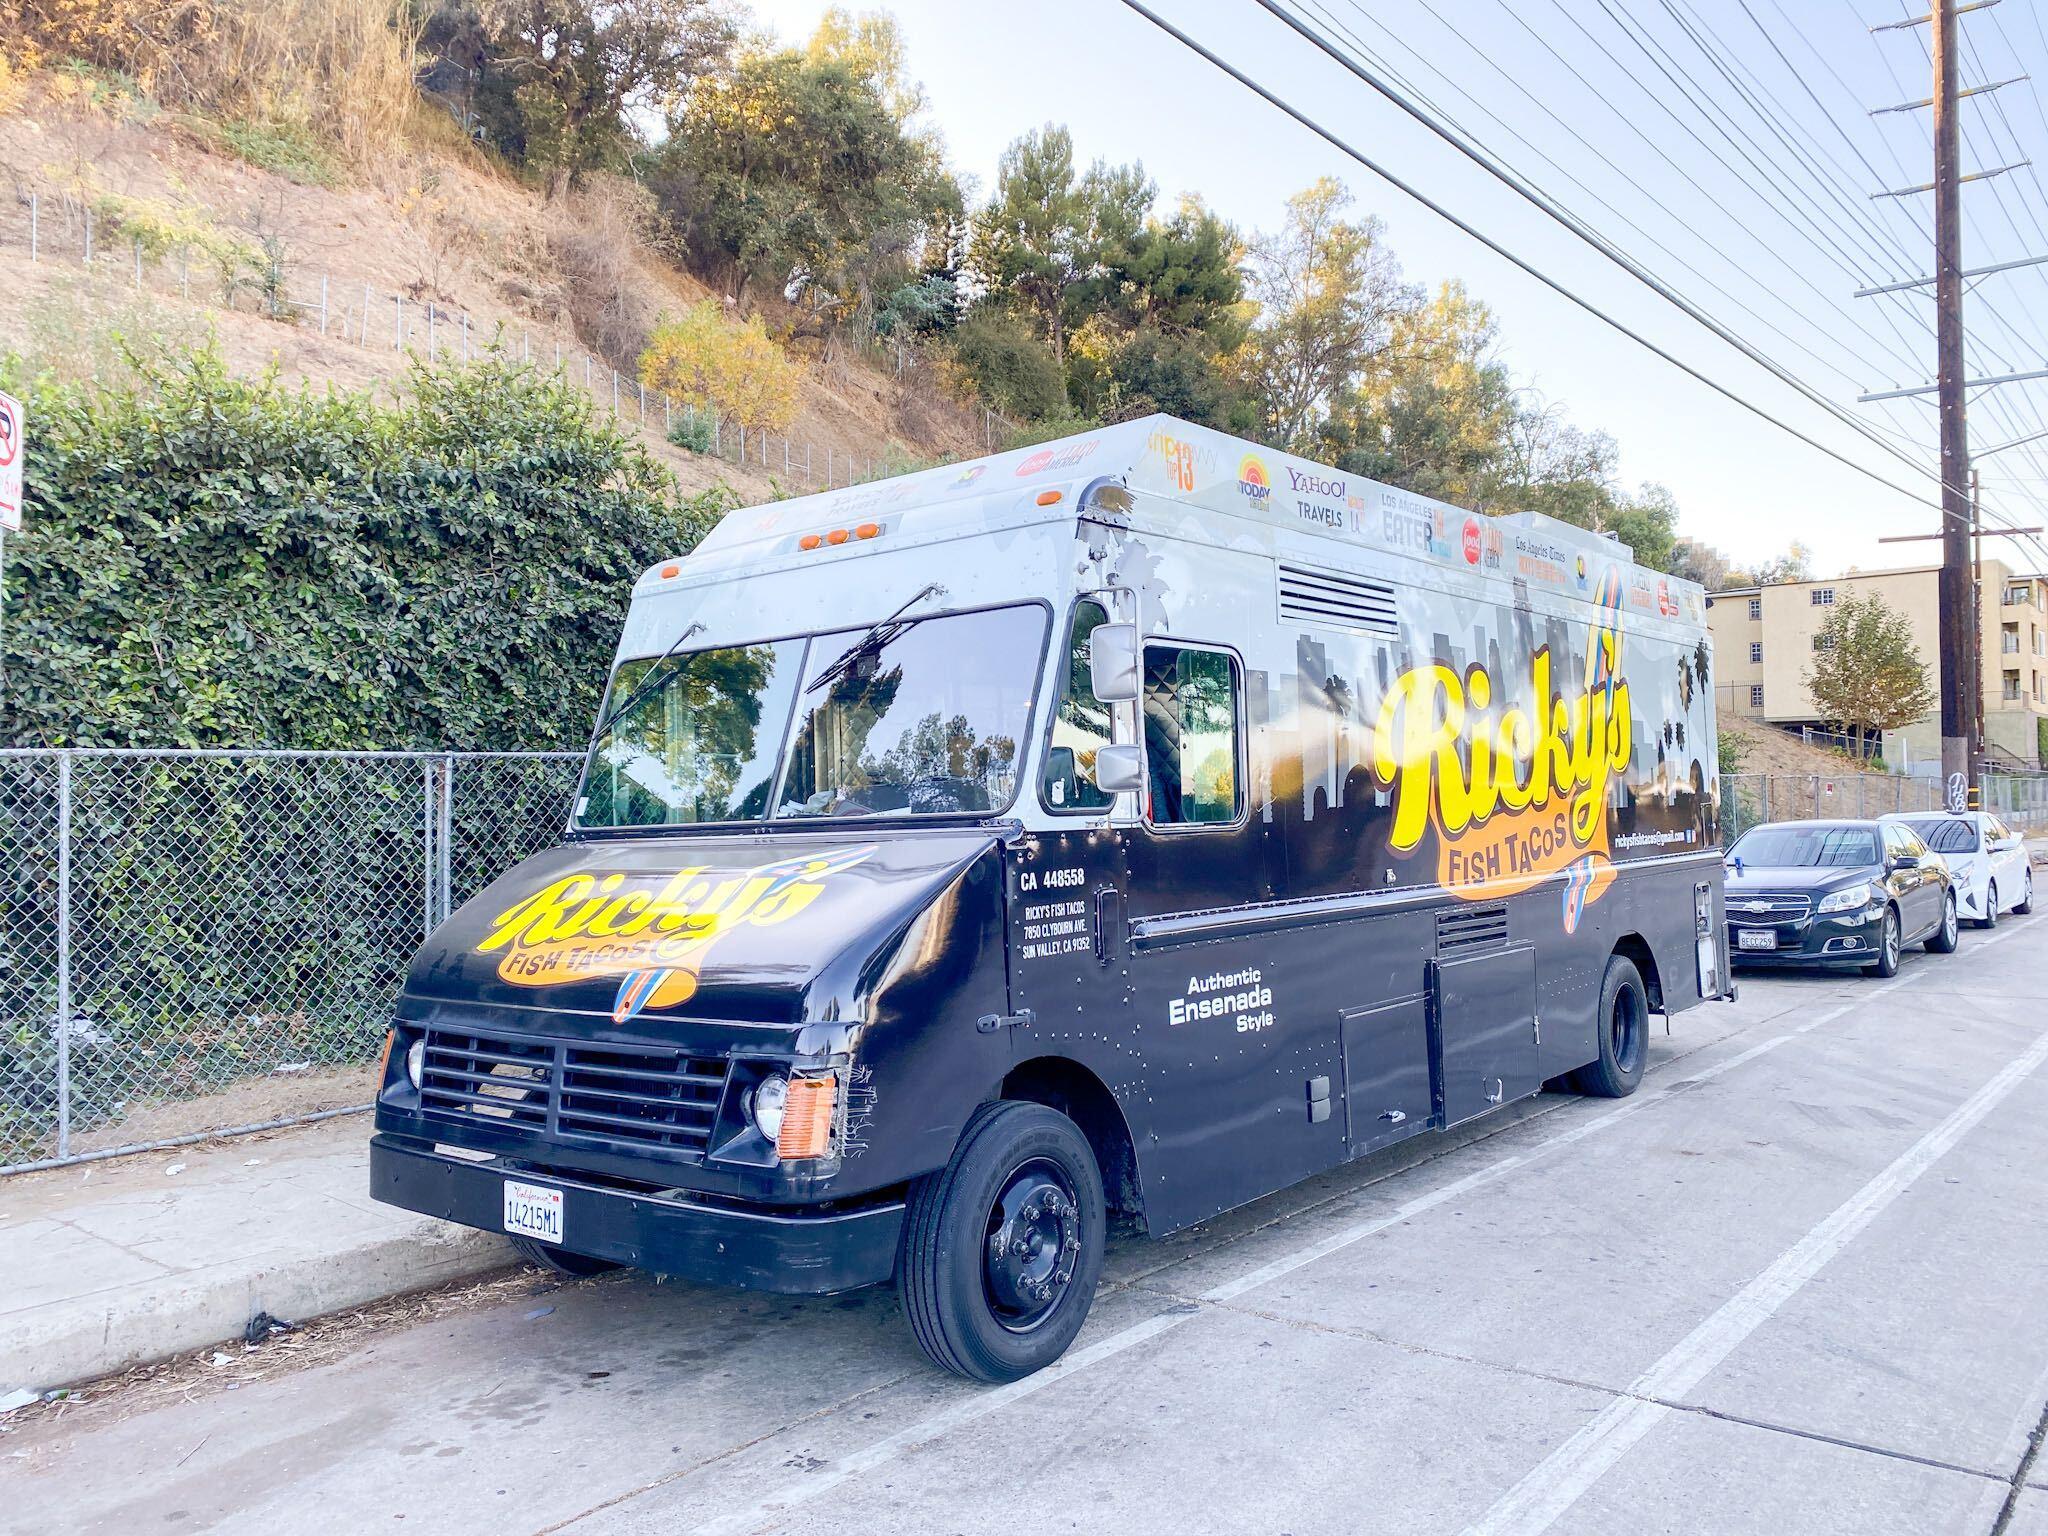 Ricky's Fish Taco Truck in December, 2020